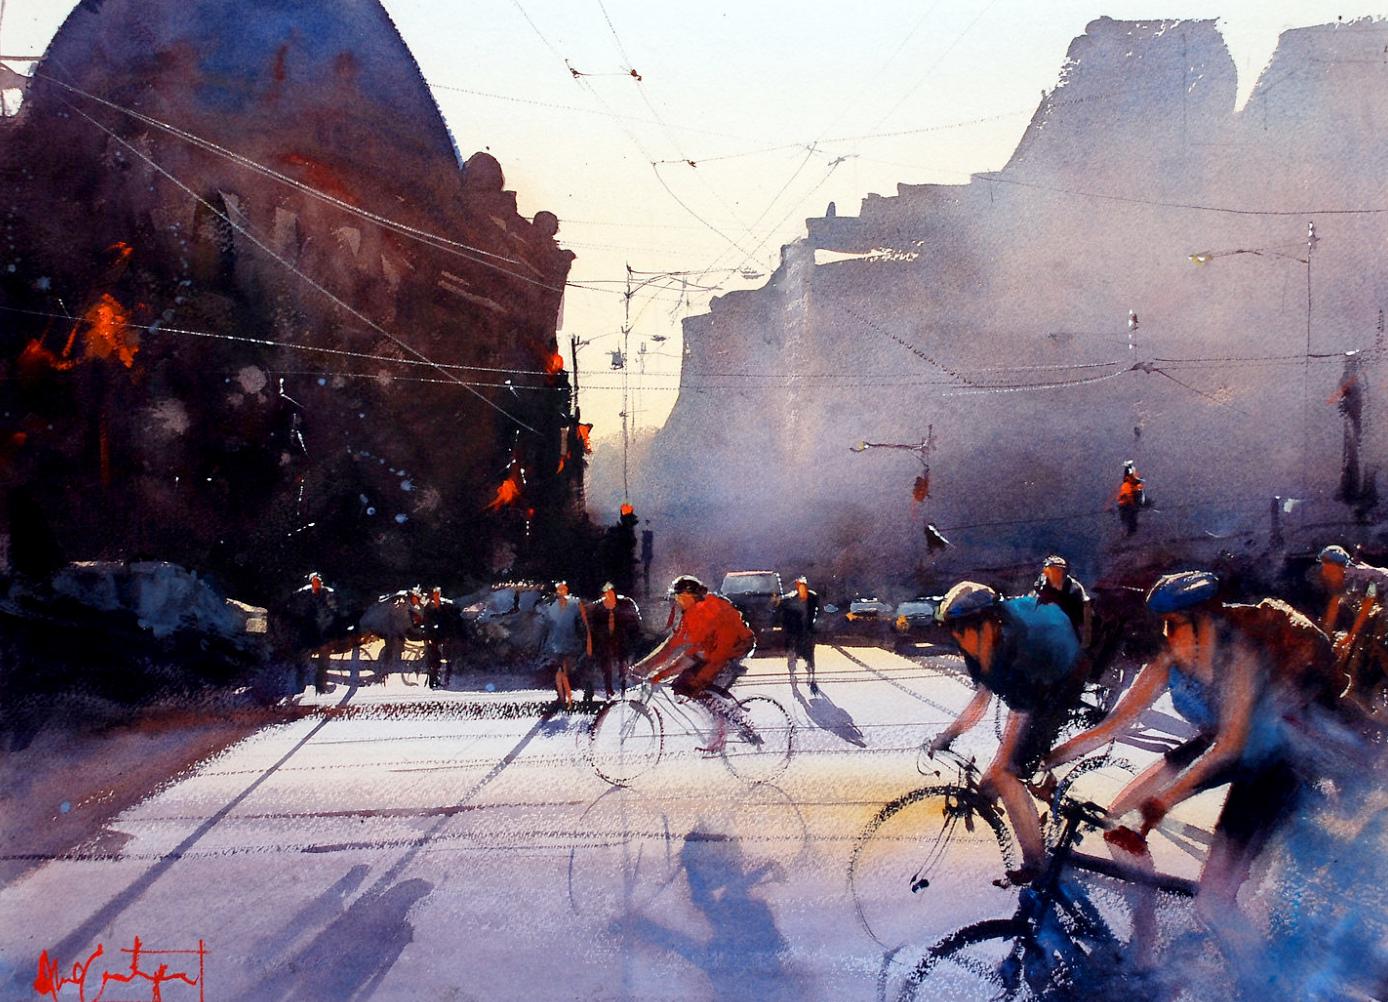 Watercolor artist magazine customer service - Alvaro Castagnet A Watercolor Painter From Montevideo Uruguay